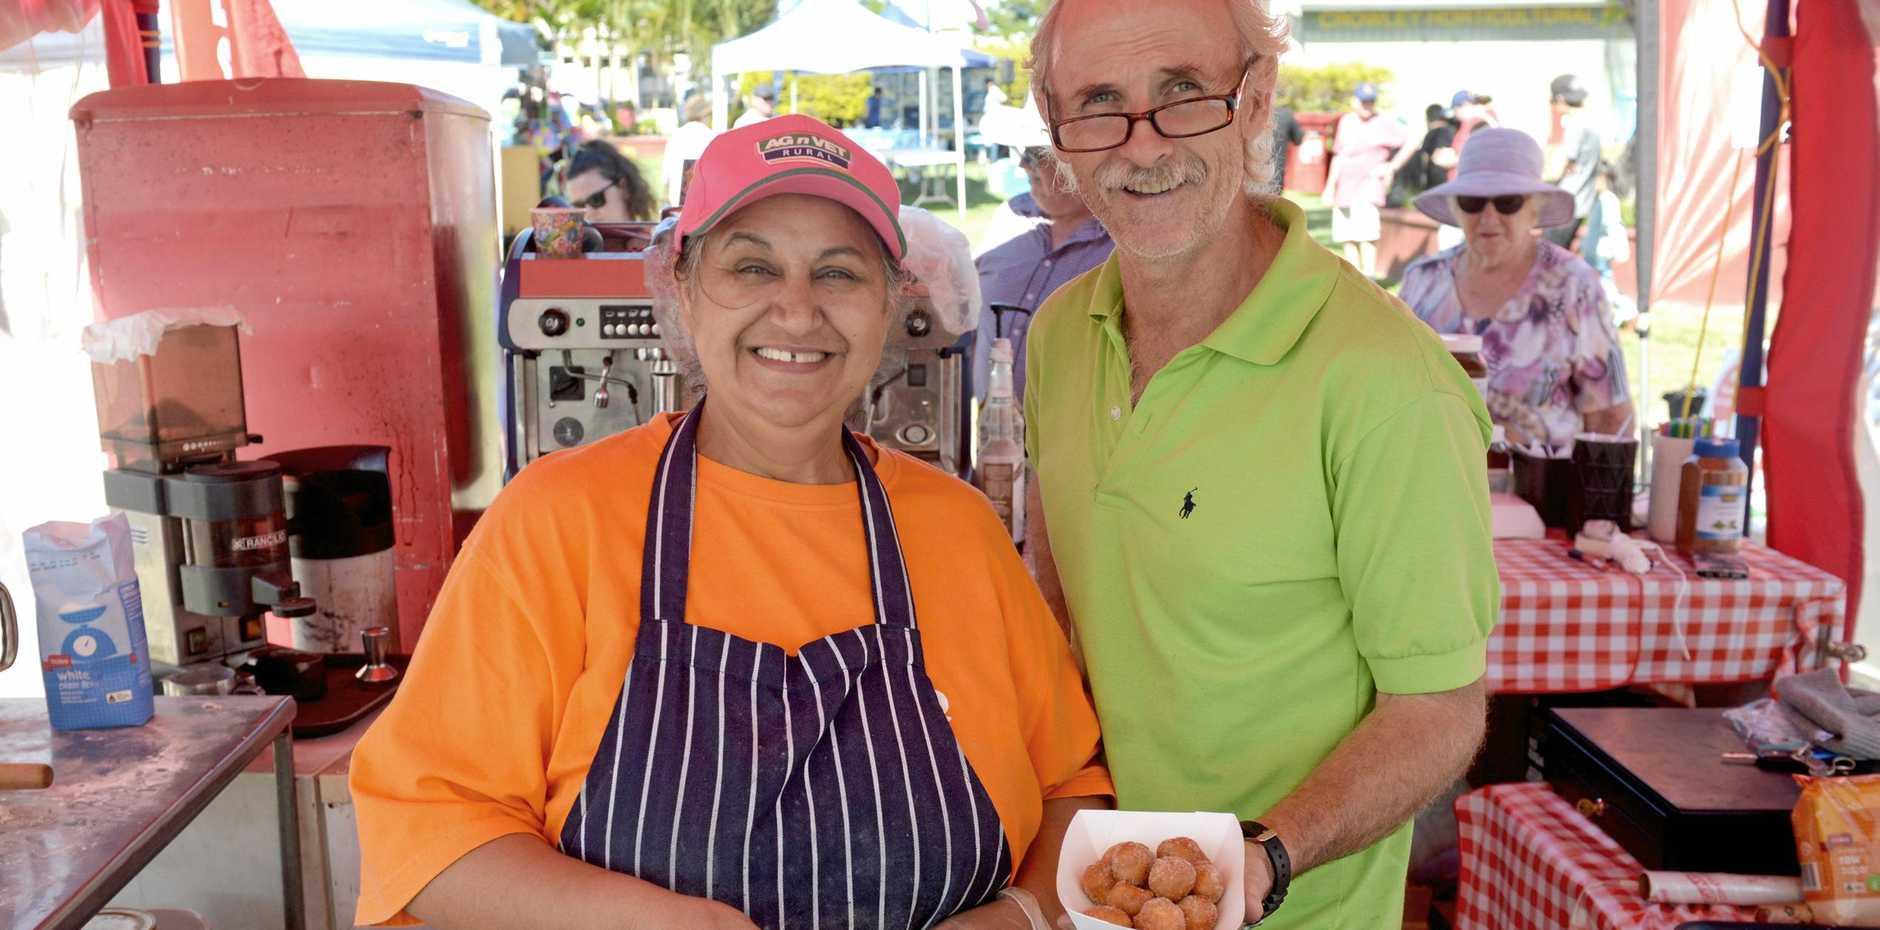 Estera and Florian Ast at Big Mama's doughnut holes stall